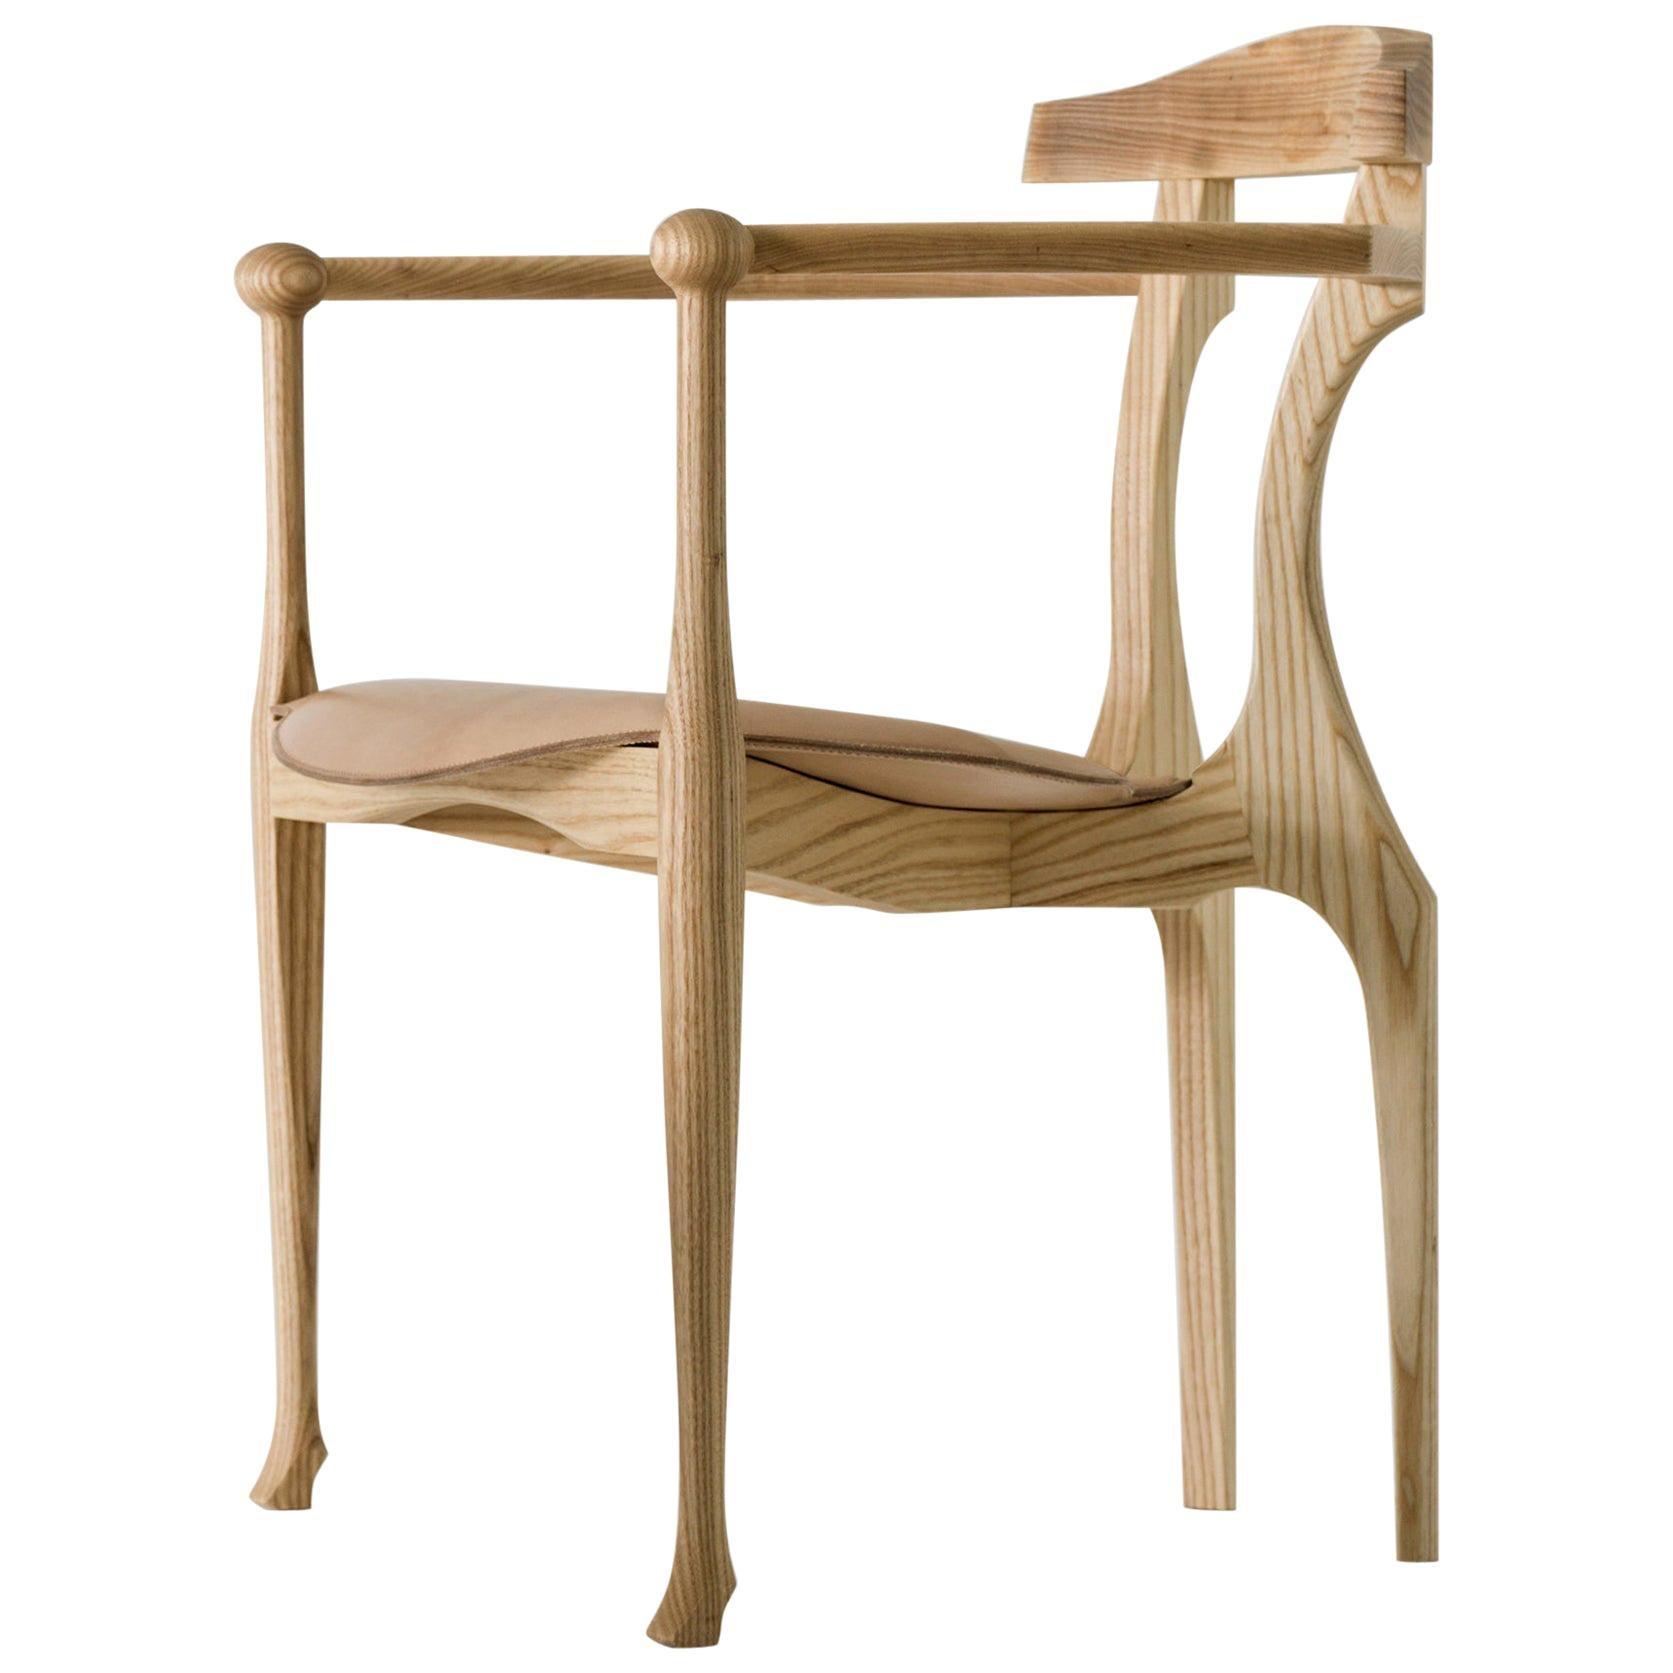 Oscar Tusquets Solid Ashwood Gaulino Easy Chair for BD Barcelona Design